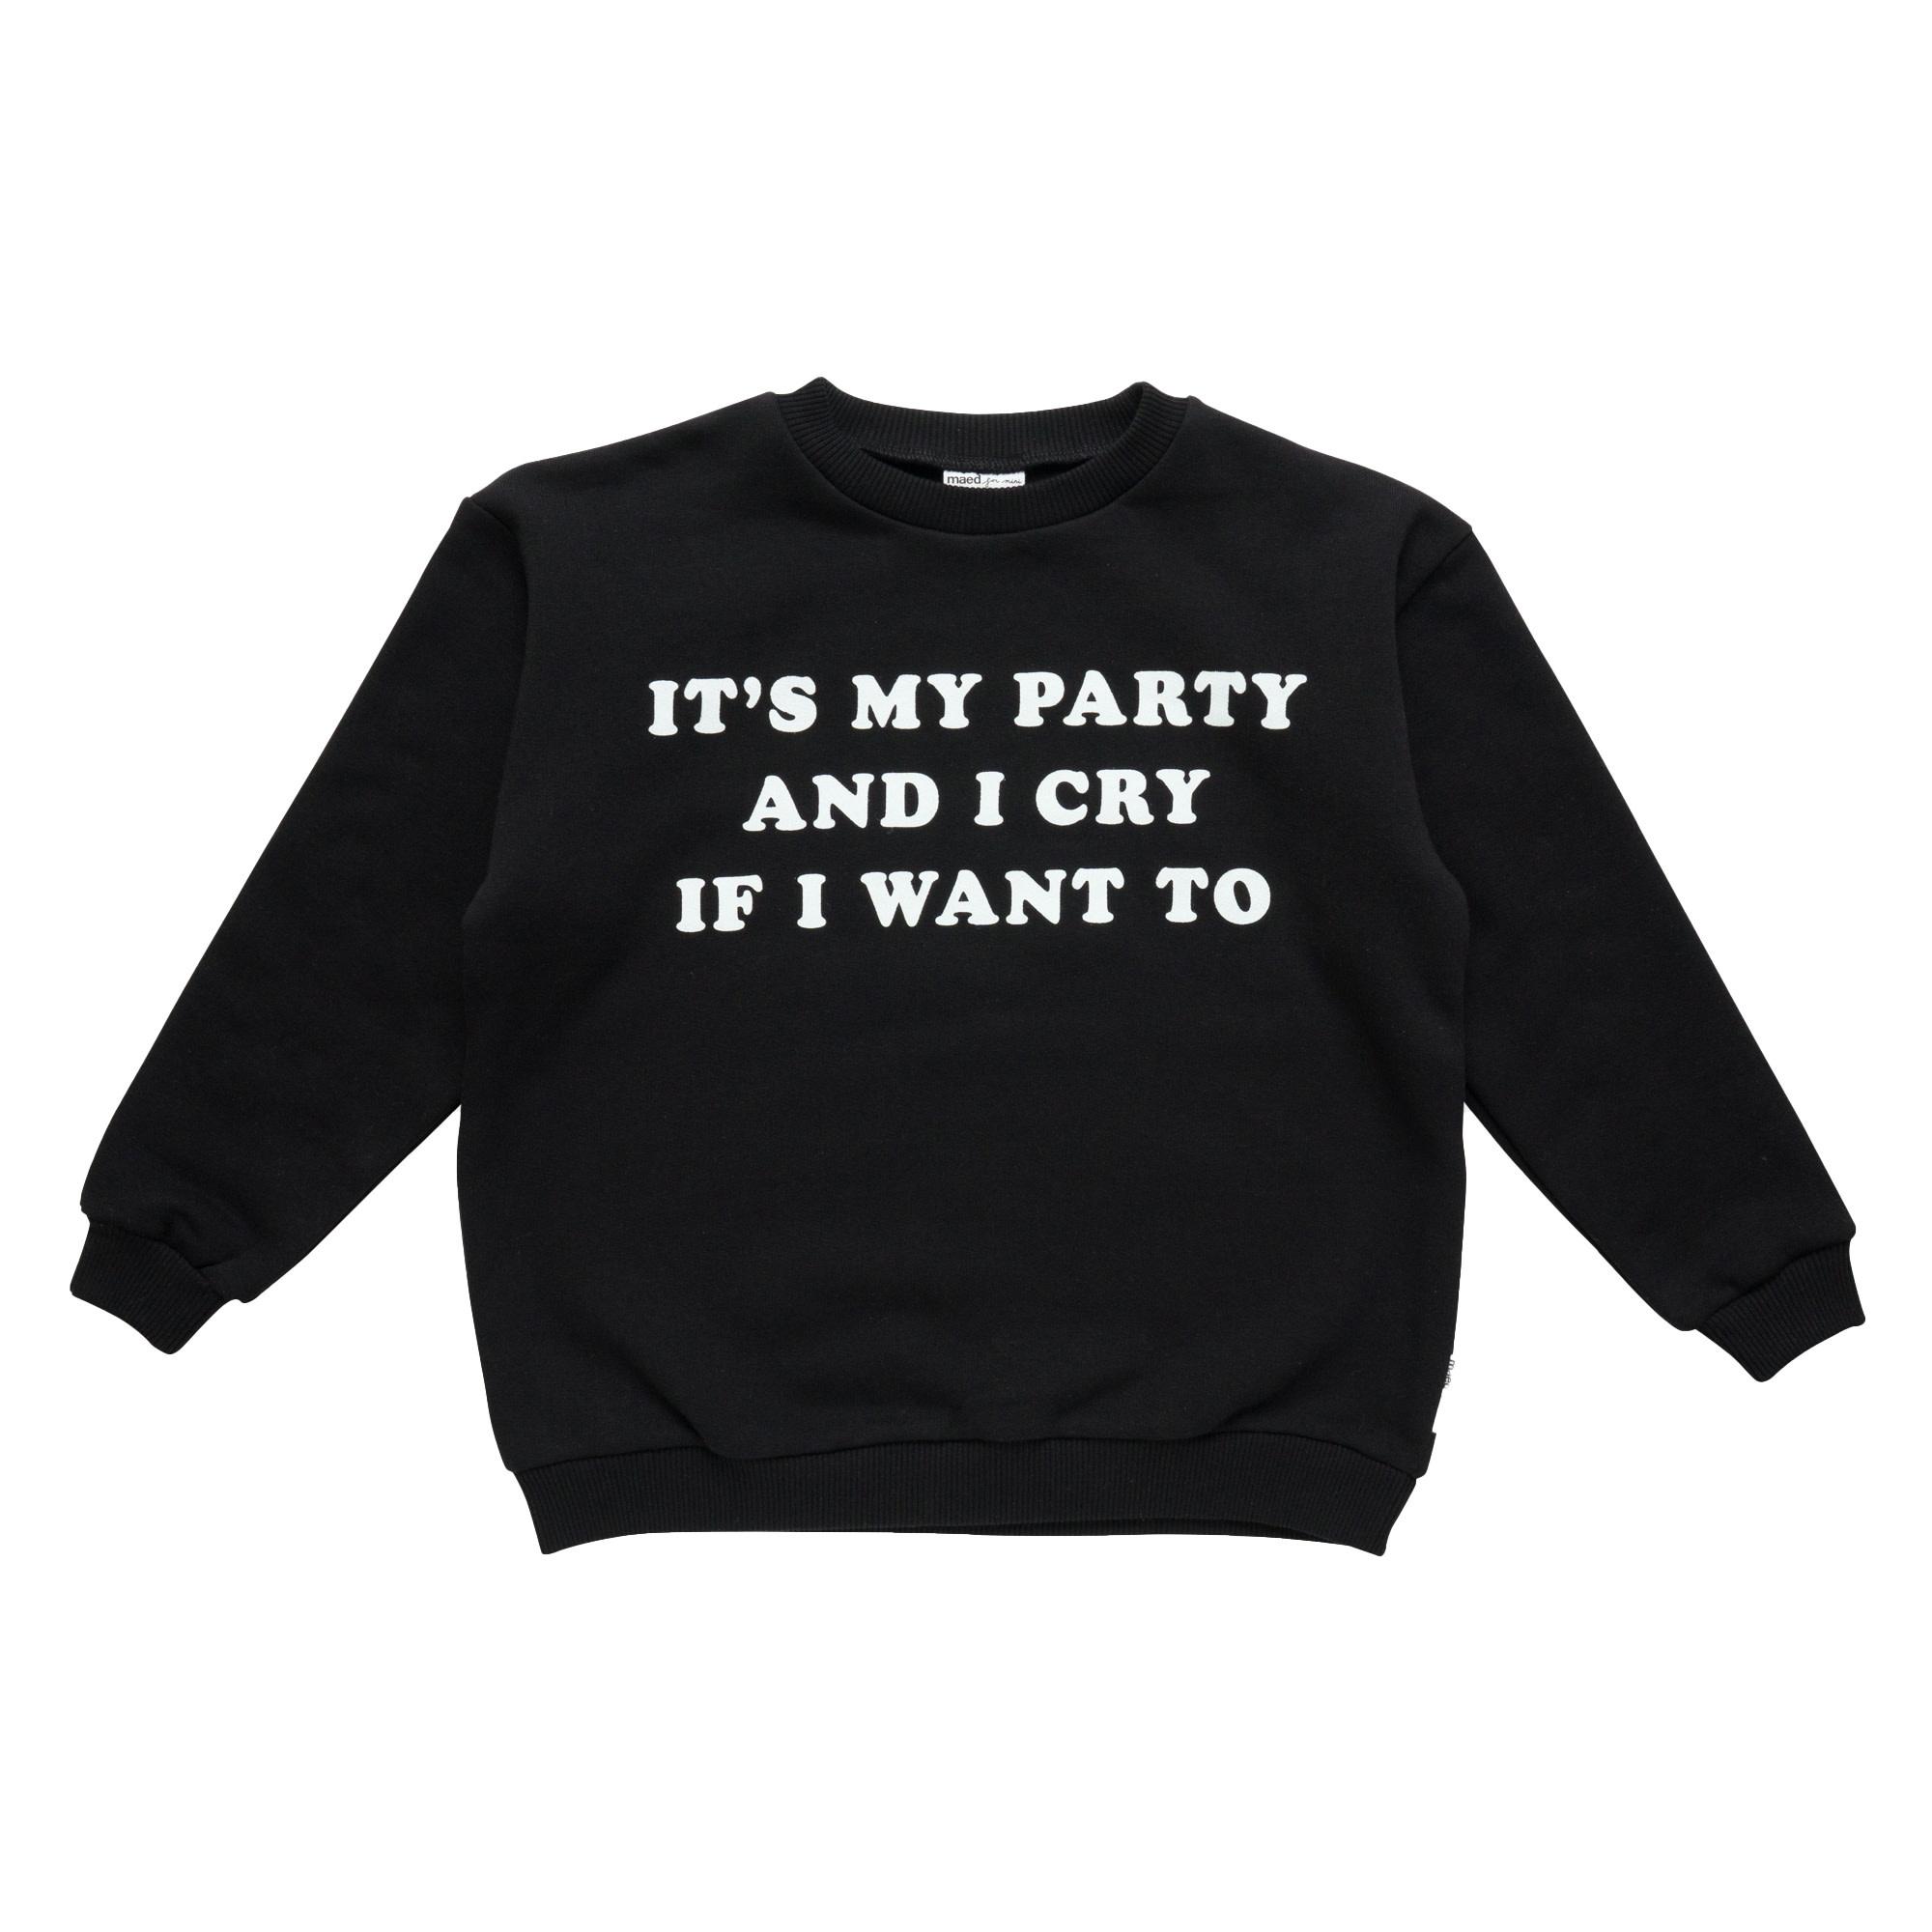 It's my party sweatshirt-1